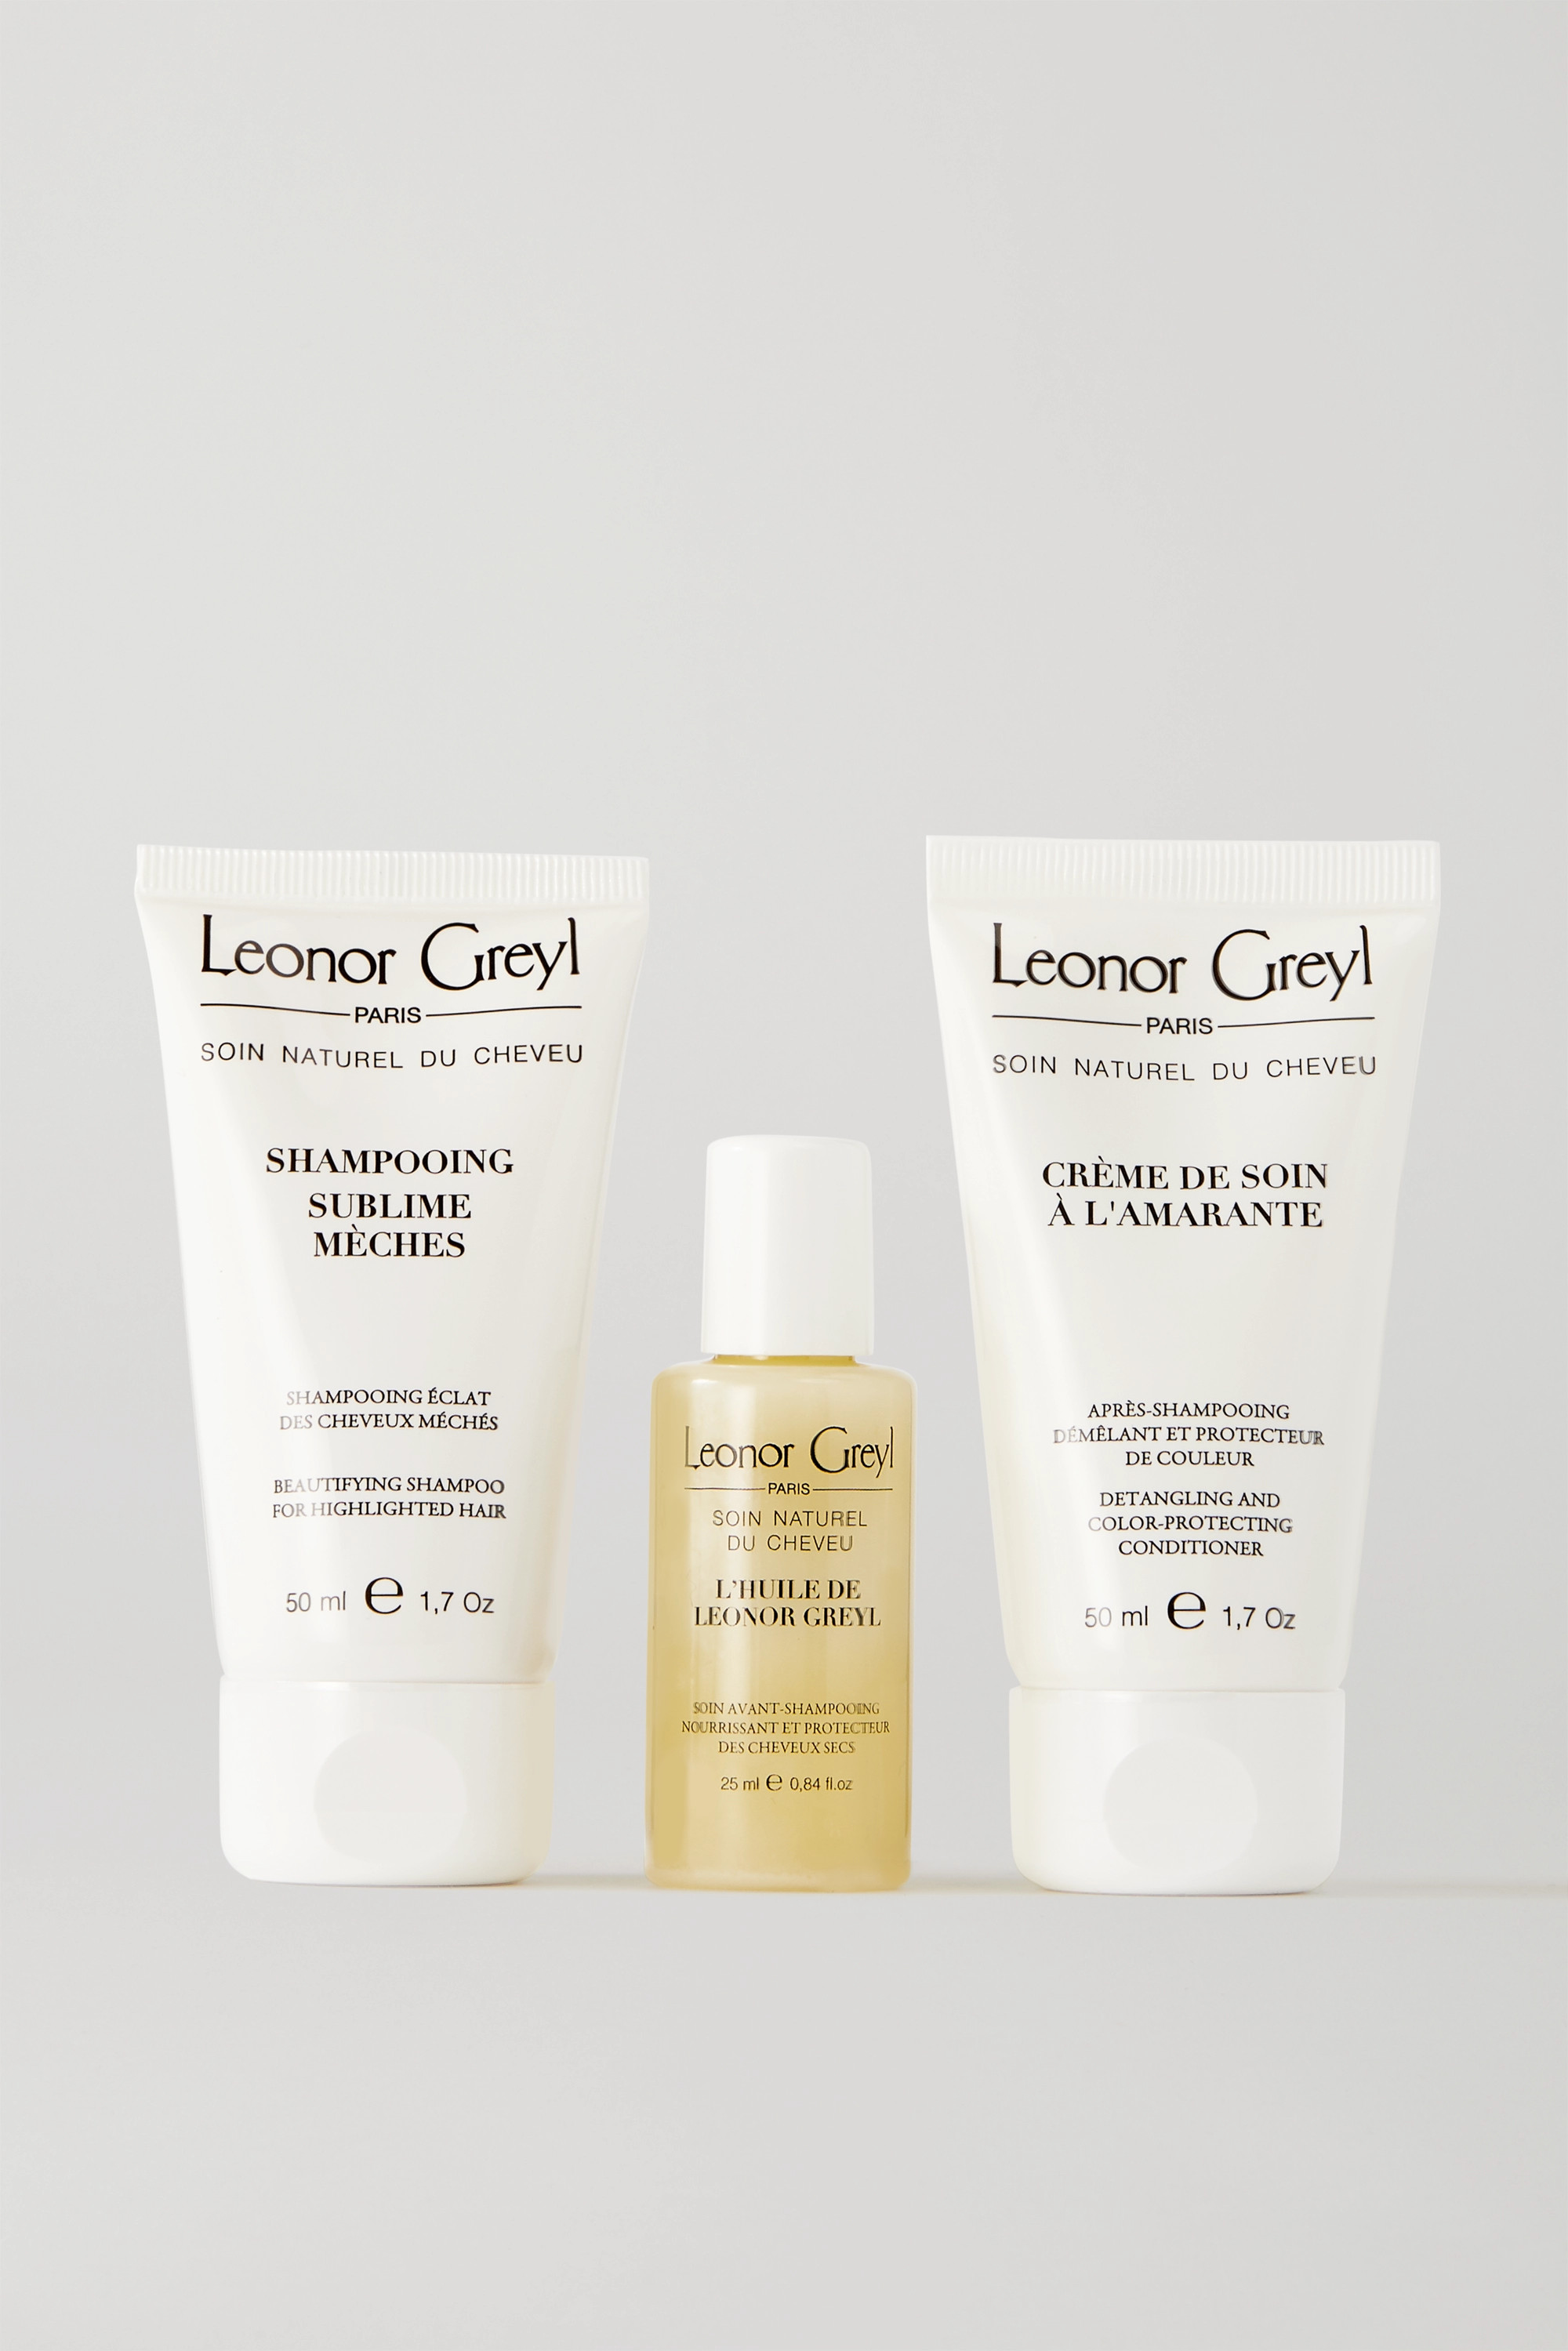 Leonor Greyl Paris Travel Kit For Volume